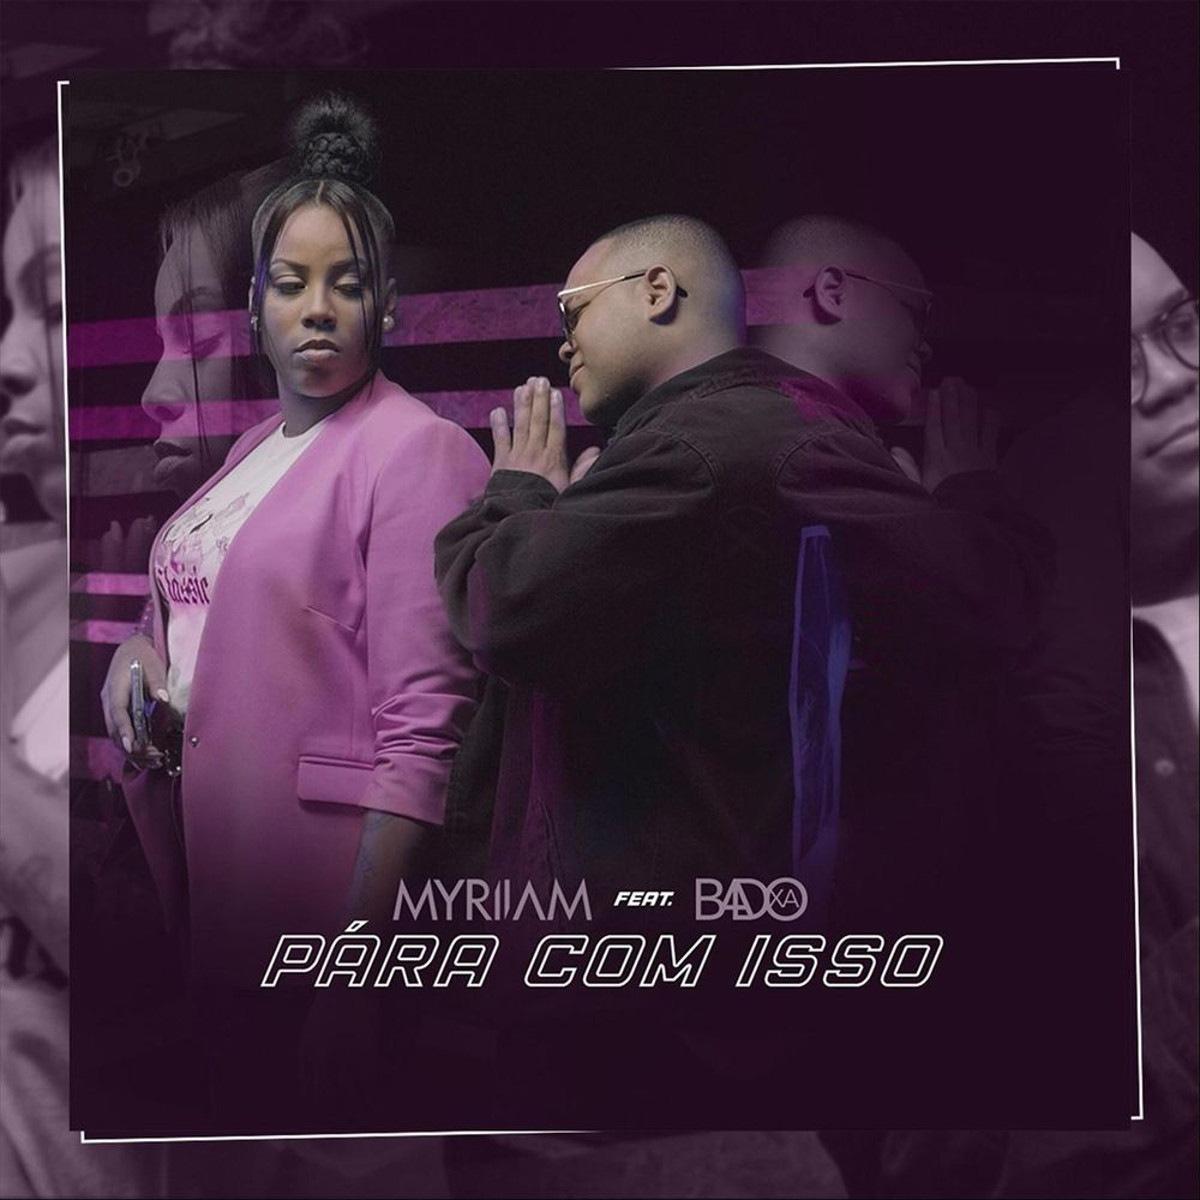 Myriiam - Pára Com Isso (feat. Badoxa) 2019